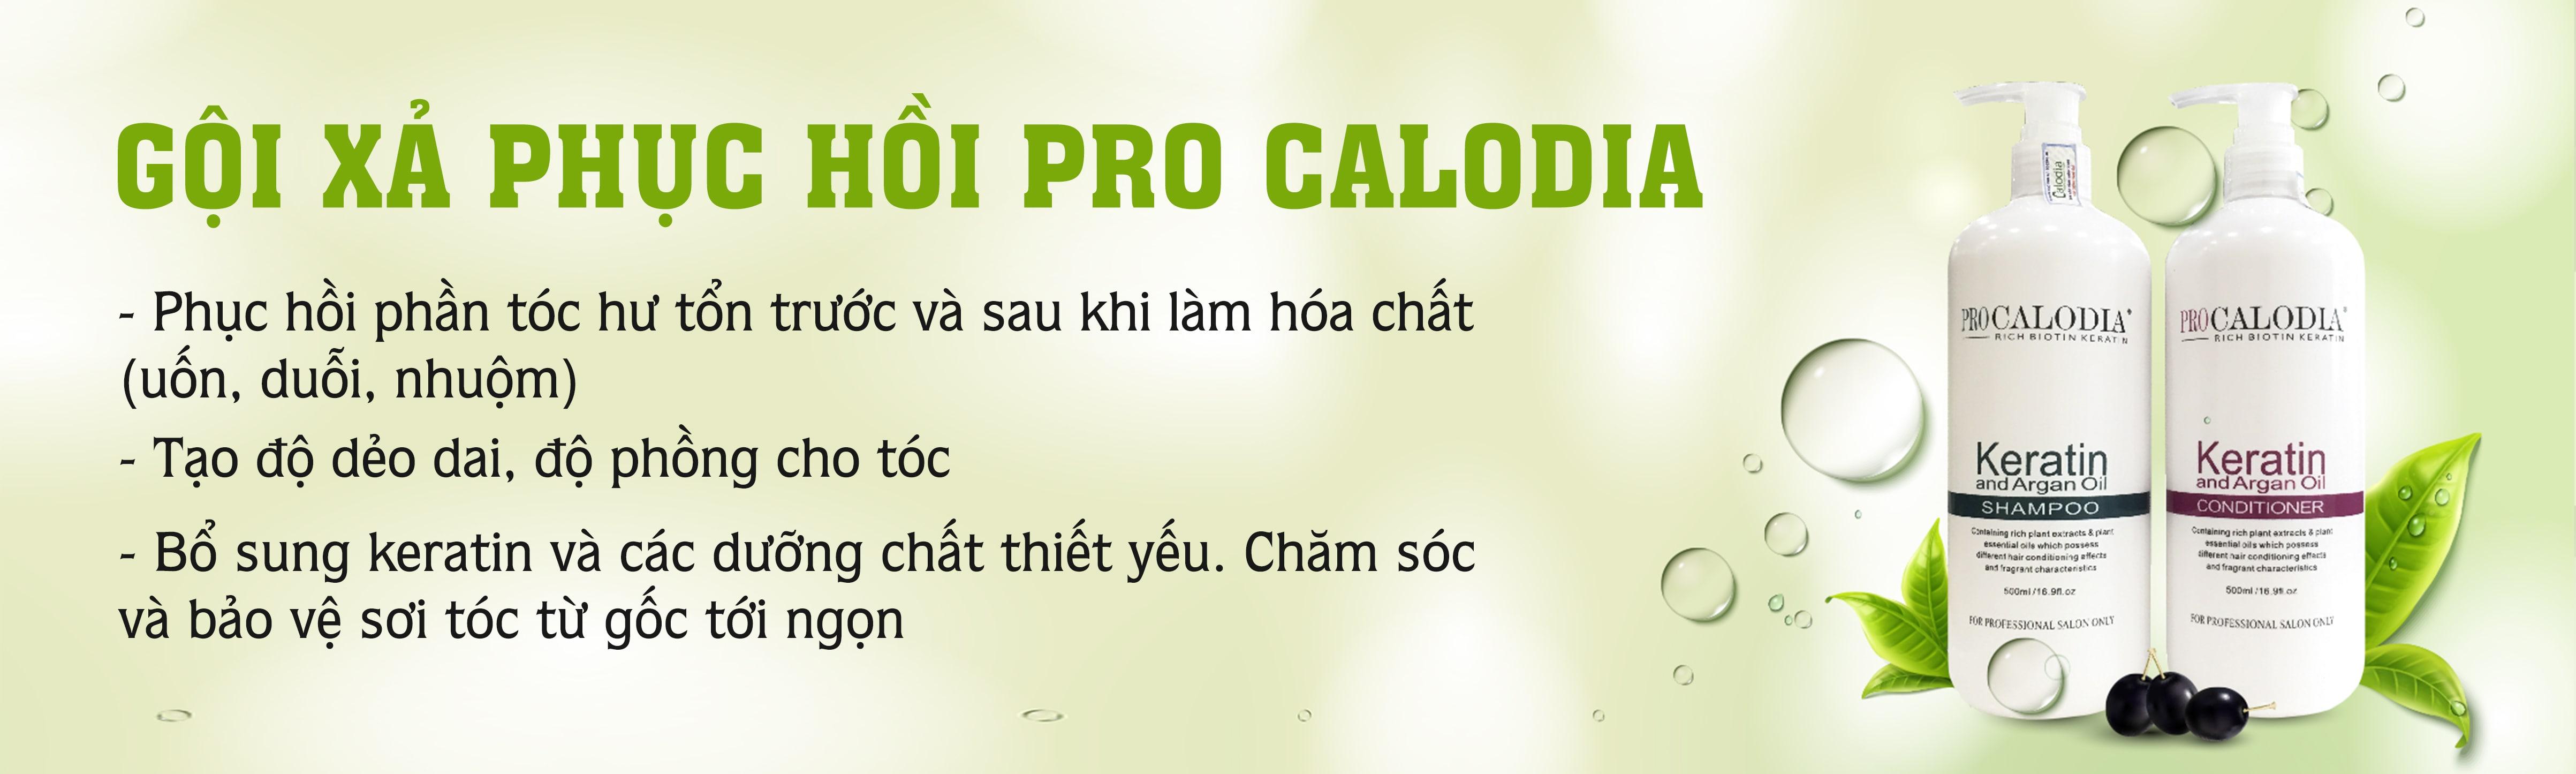 1561368245_bo-dau-goi-xa-phuc-hoi-pro-calod.jpg